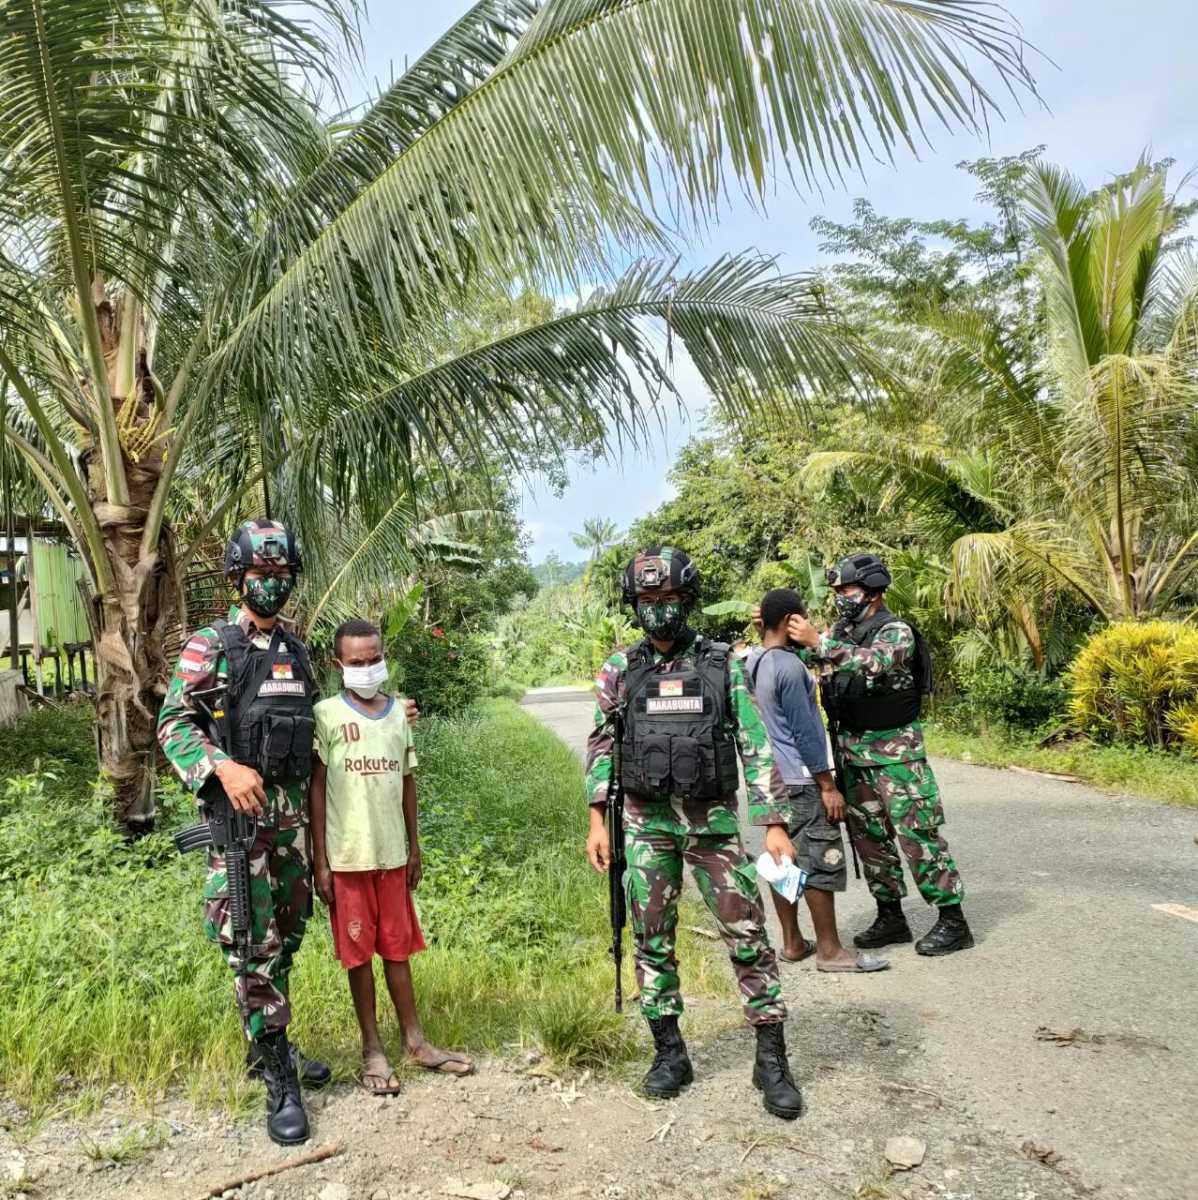 Tingkatkat Disiplin Prokes, Satgas Yonif 512 Bagikan Masker Kepada Masyarakat Perbatasan Papua